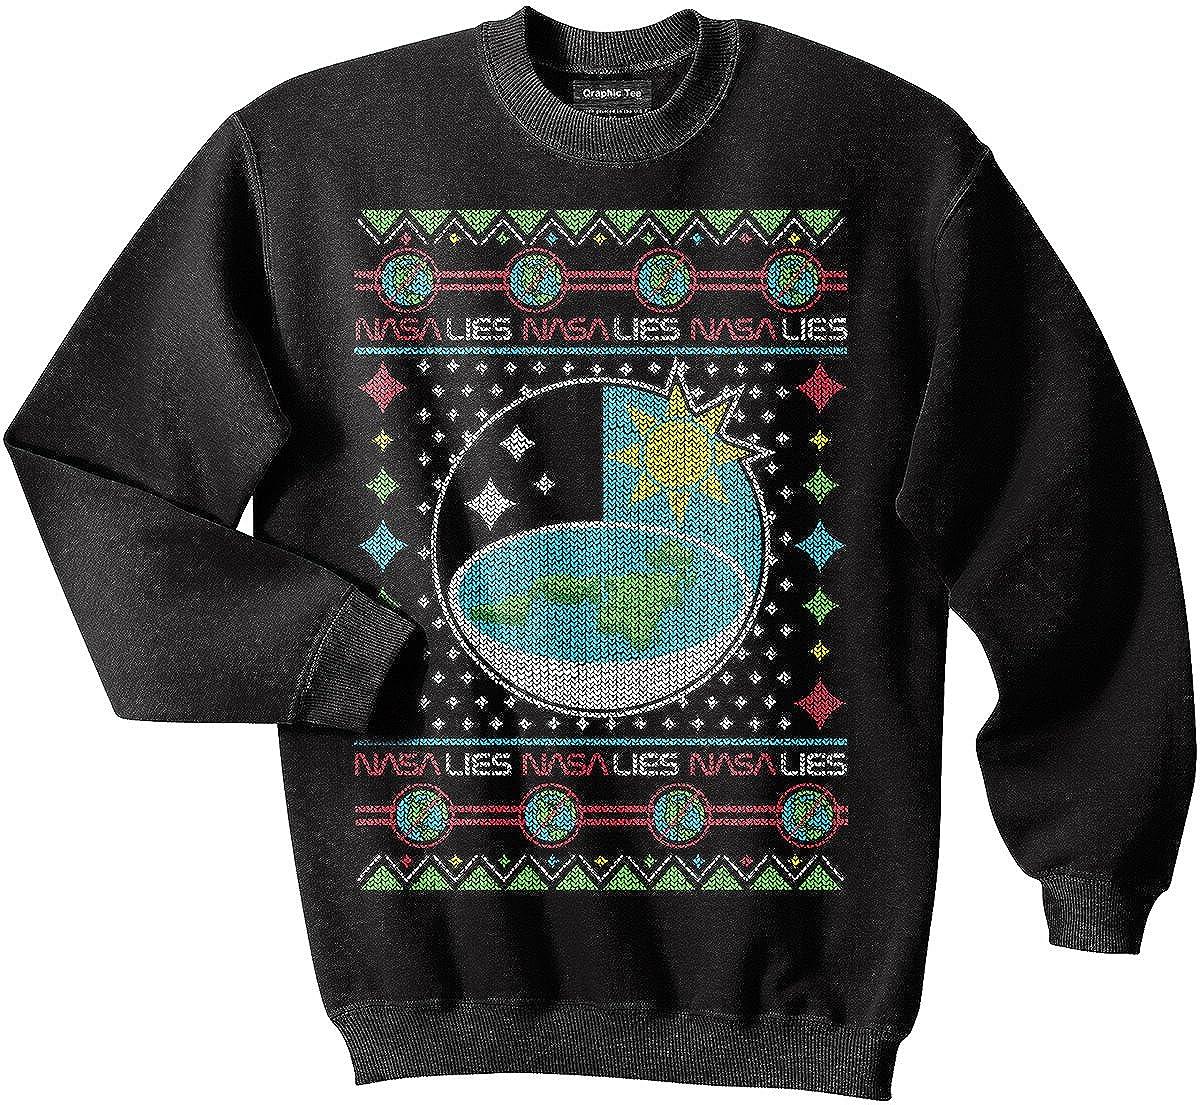 Amazon.com: Flat Earth sweatshirt, NASA, Earth is flat sweatshirt ...